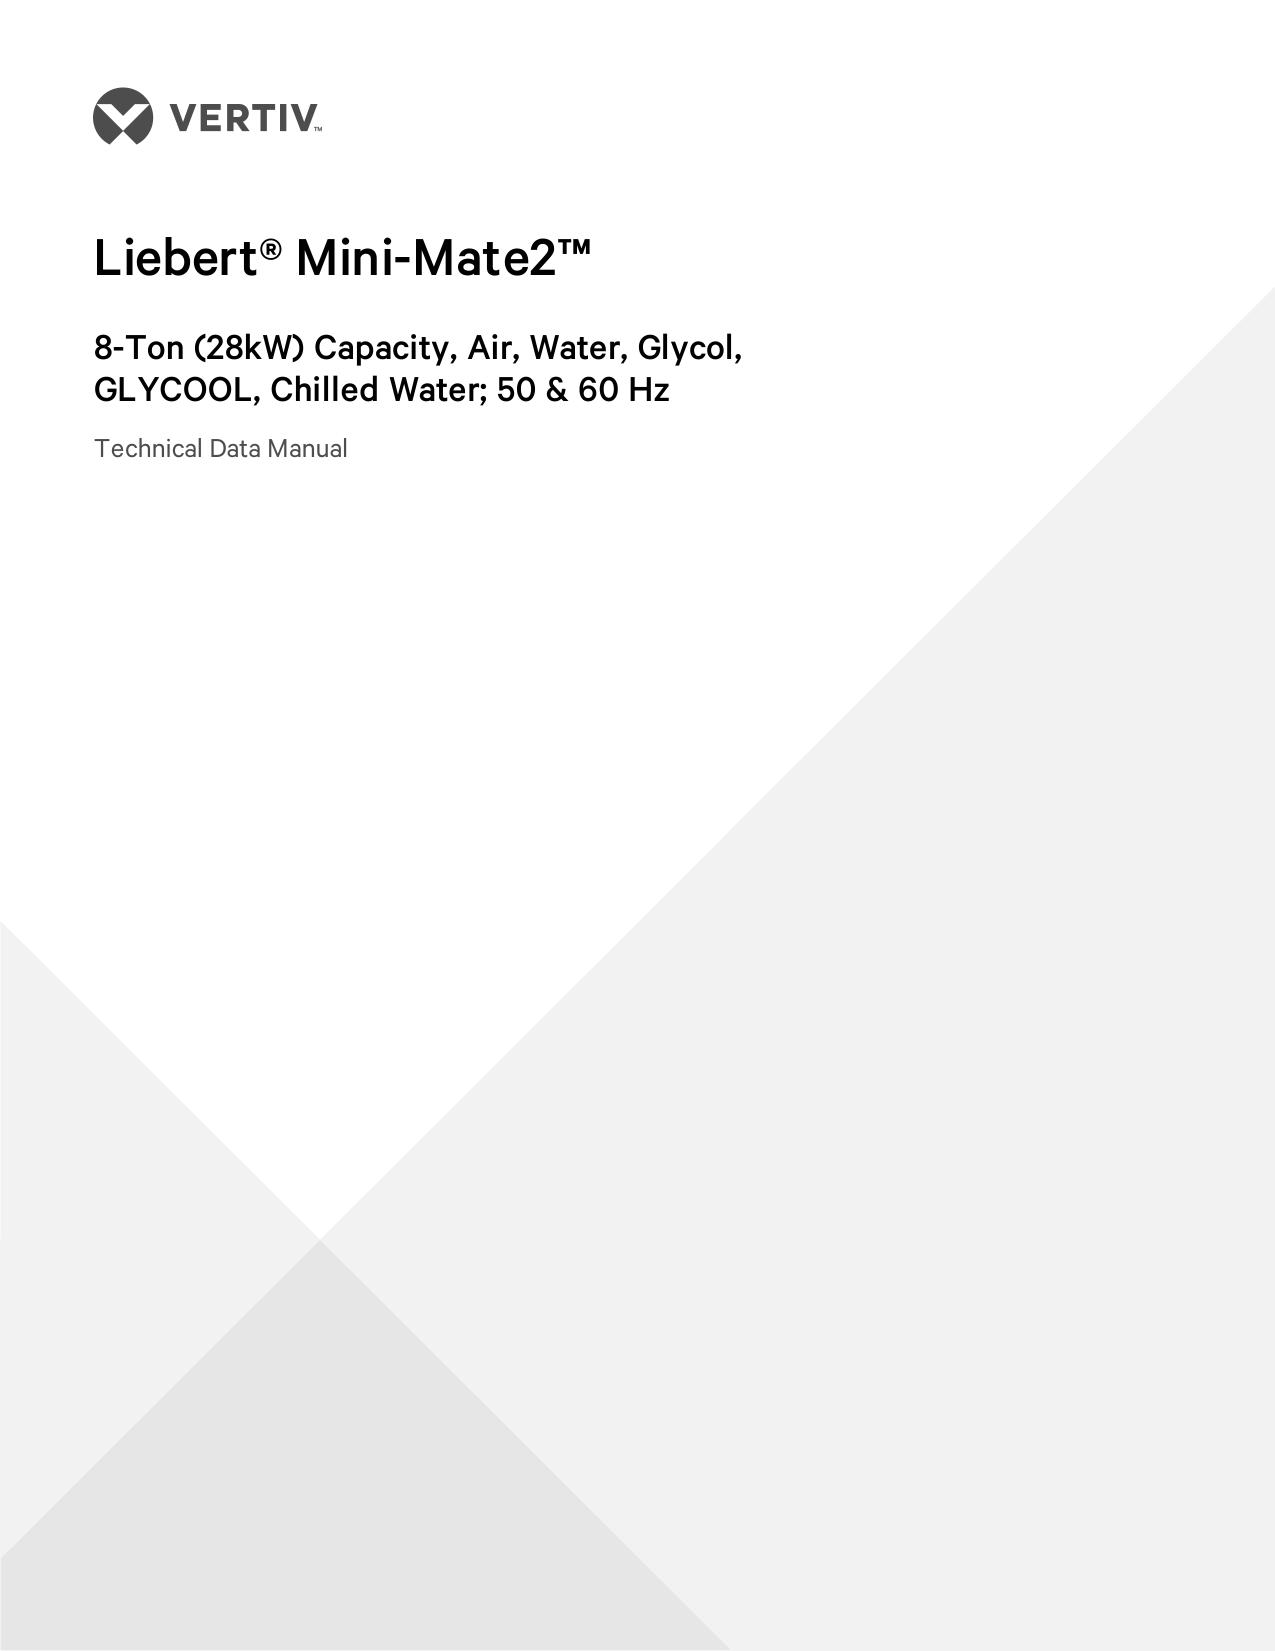 Liebert Mini-Mate2—8 ton Technical Data Manual | manualzz com